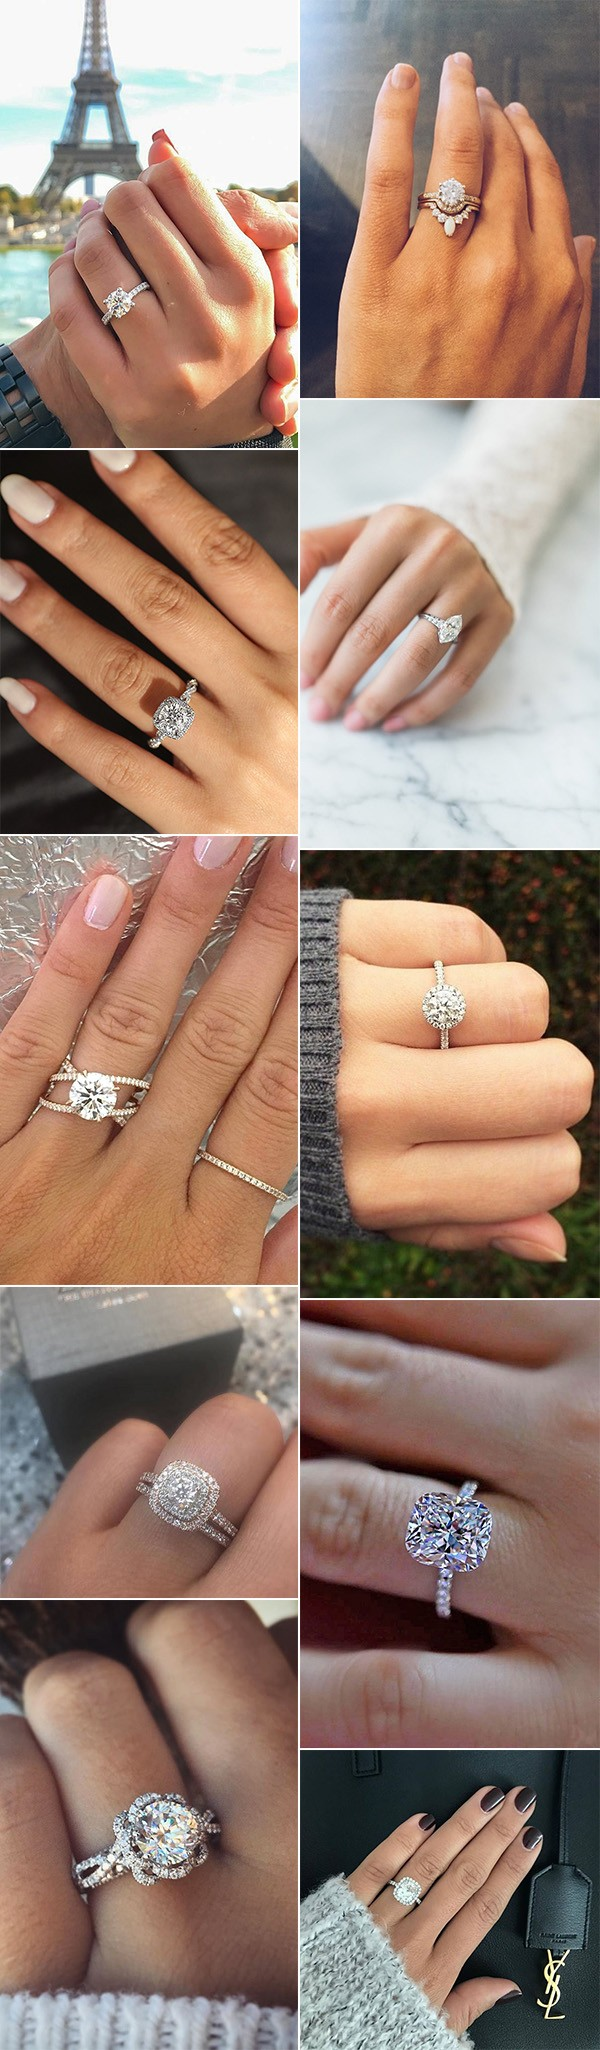 brilliant wedding engagement ring ideas